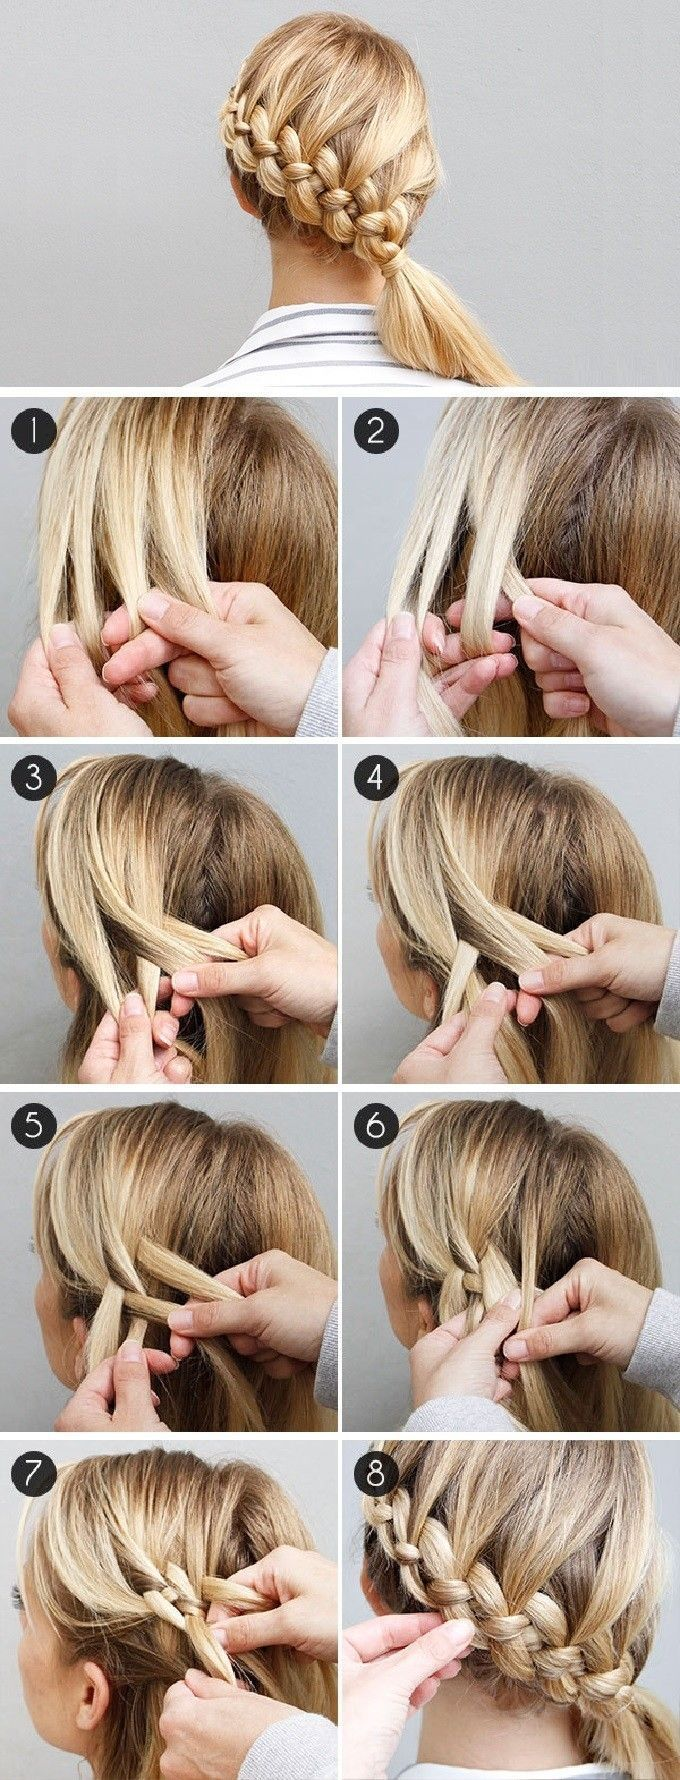 143 best diy hairstyles images on pinterest | hairstyles, diy